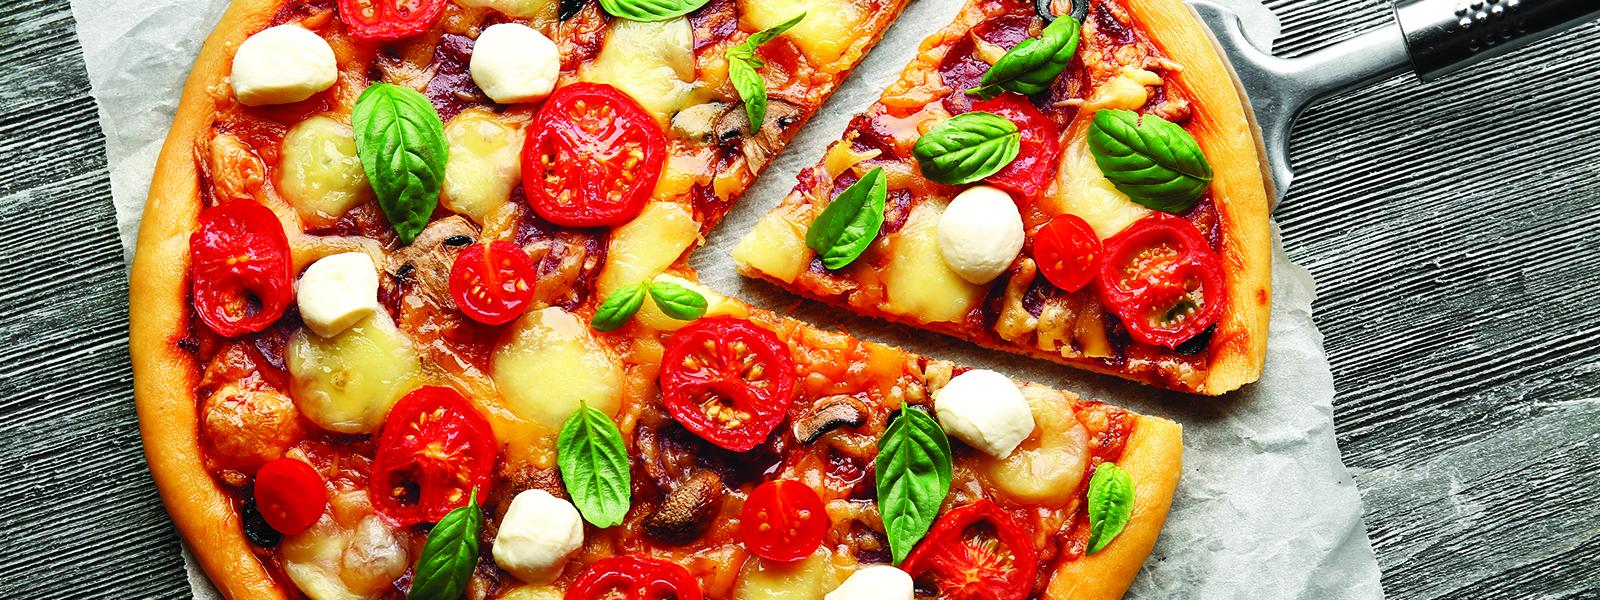 Flames Pizza Flames Pizza Romford Takeaway Order Online